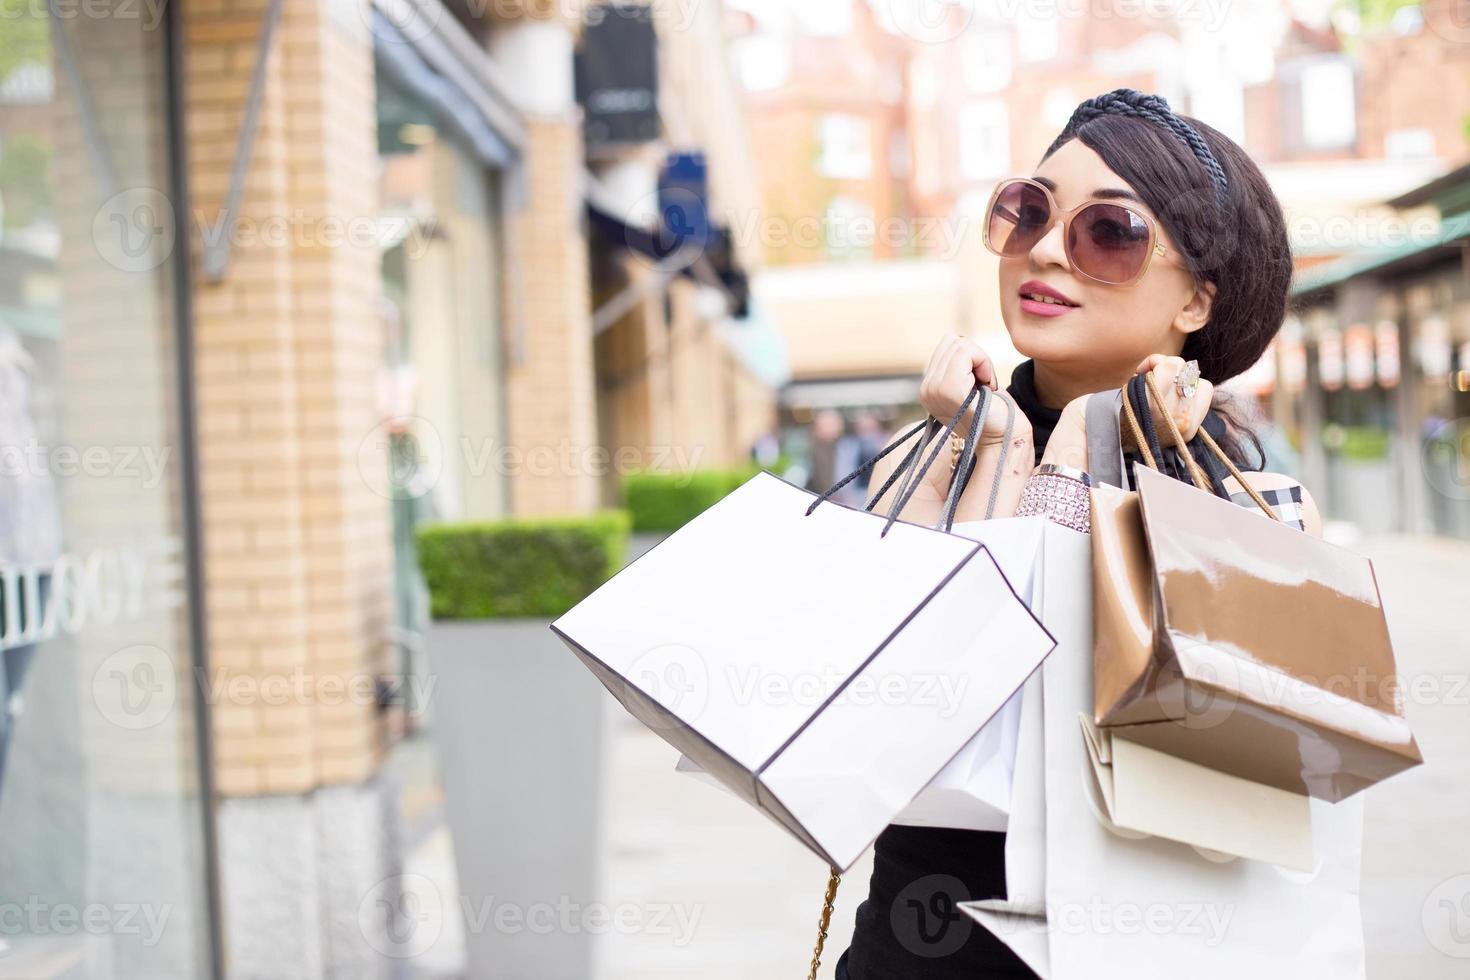 shopping girl photo